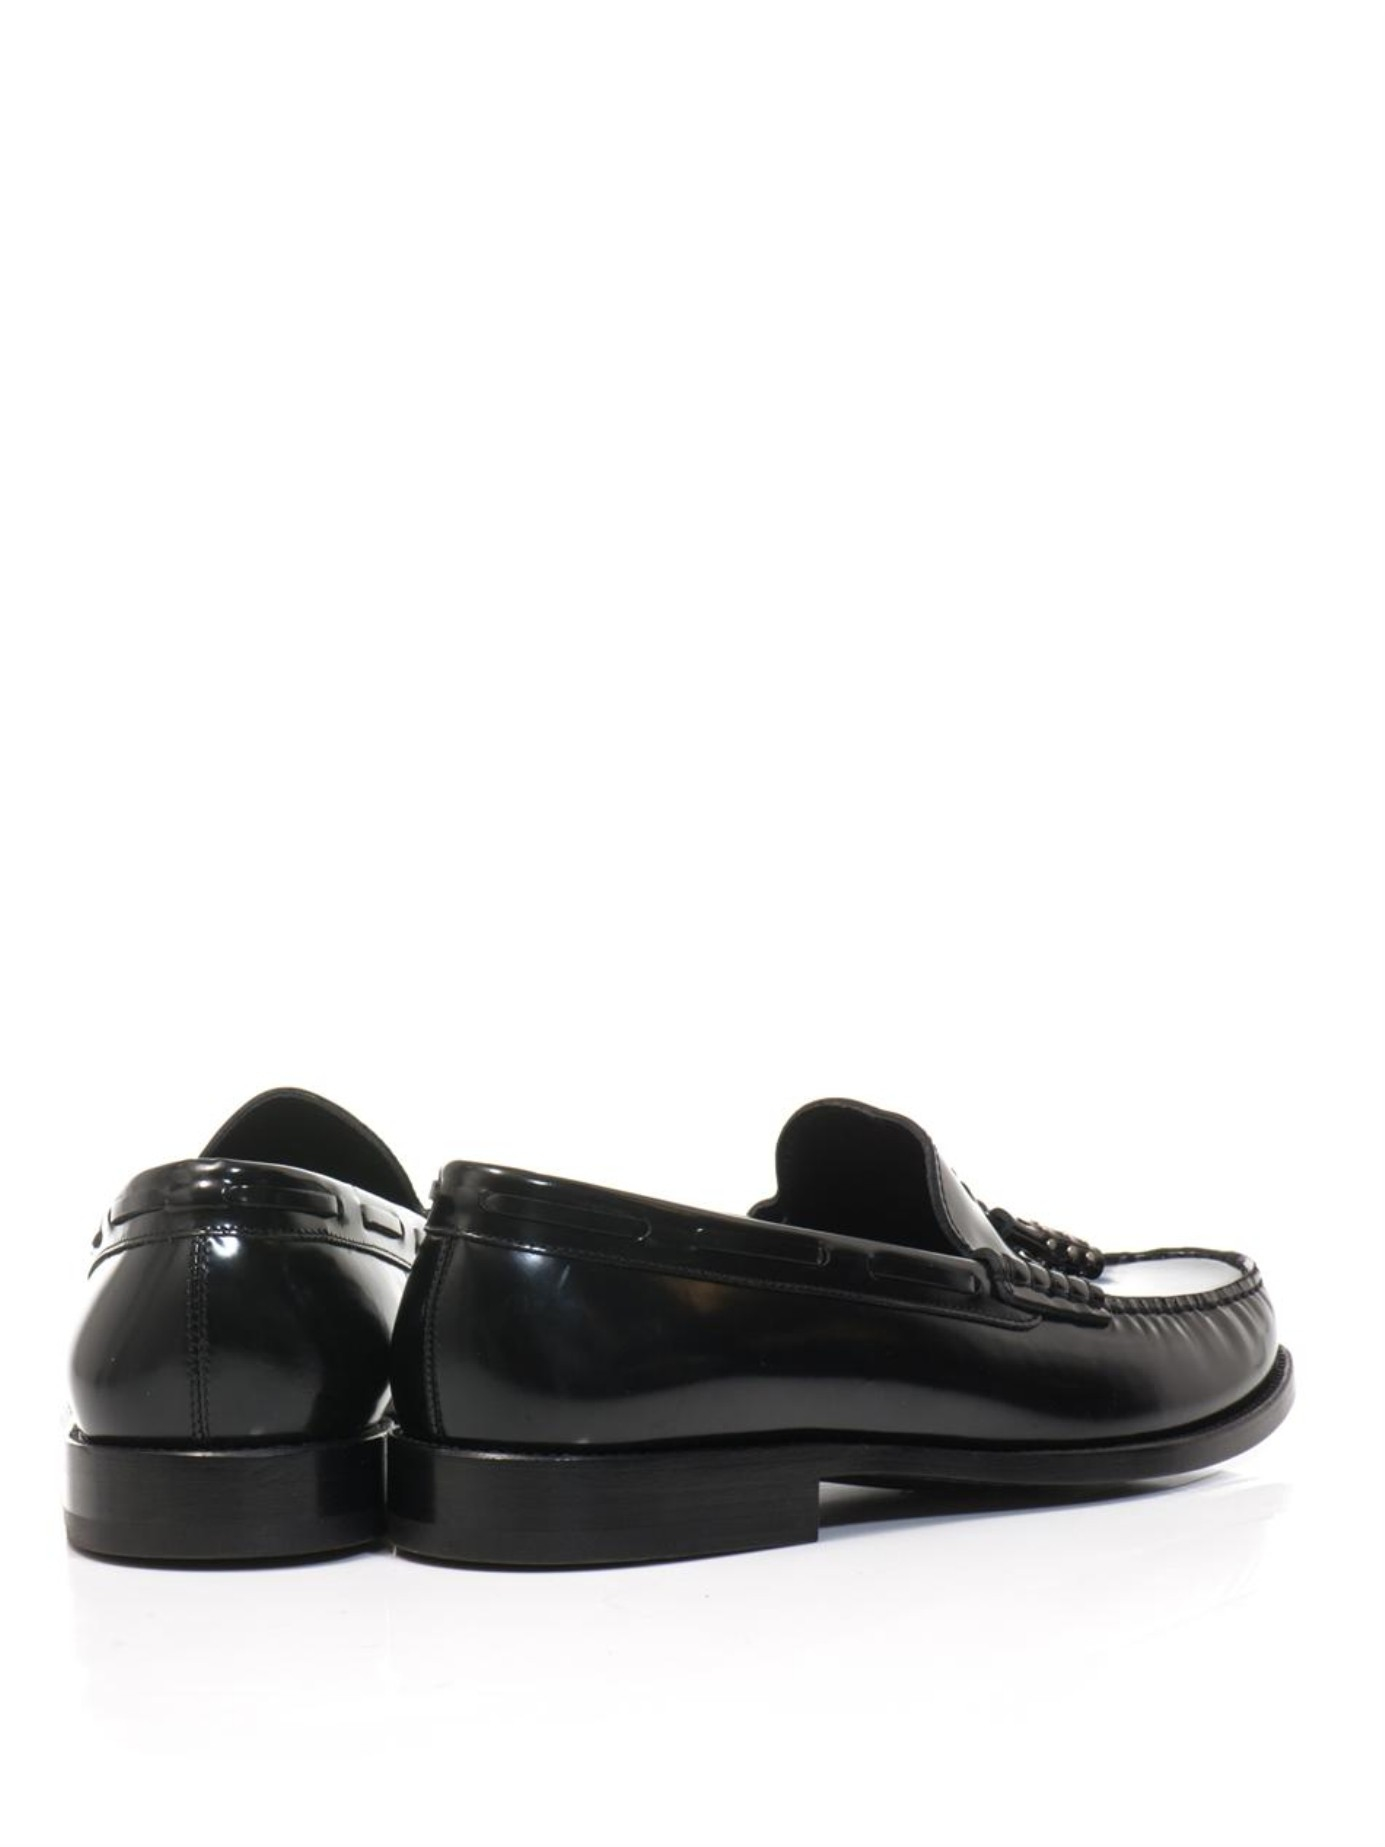 Tasselled Leather Loafers Saint Laurent SYvvMrV